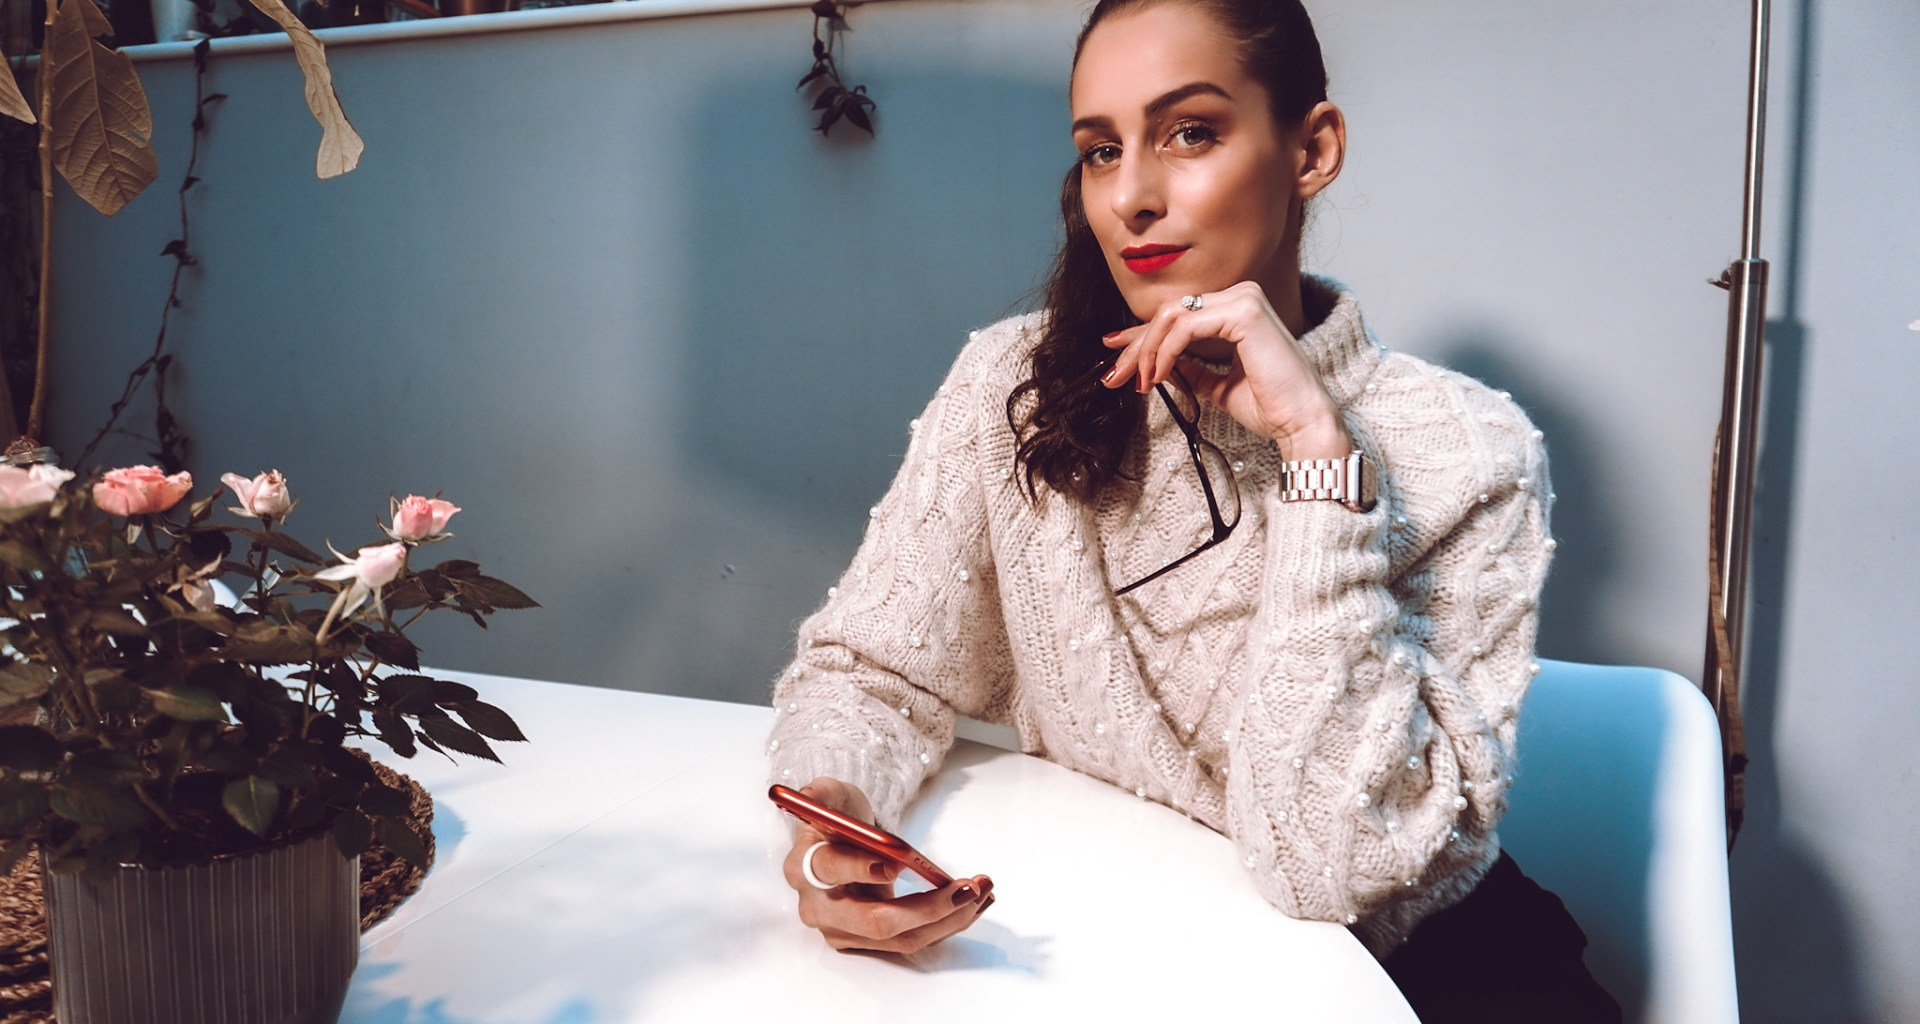 Meus 7 Aplicativos favoritos para mulheres empreendedoras e blogueiras5